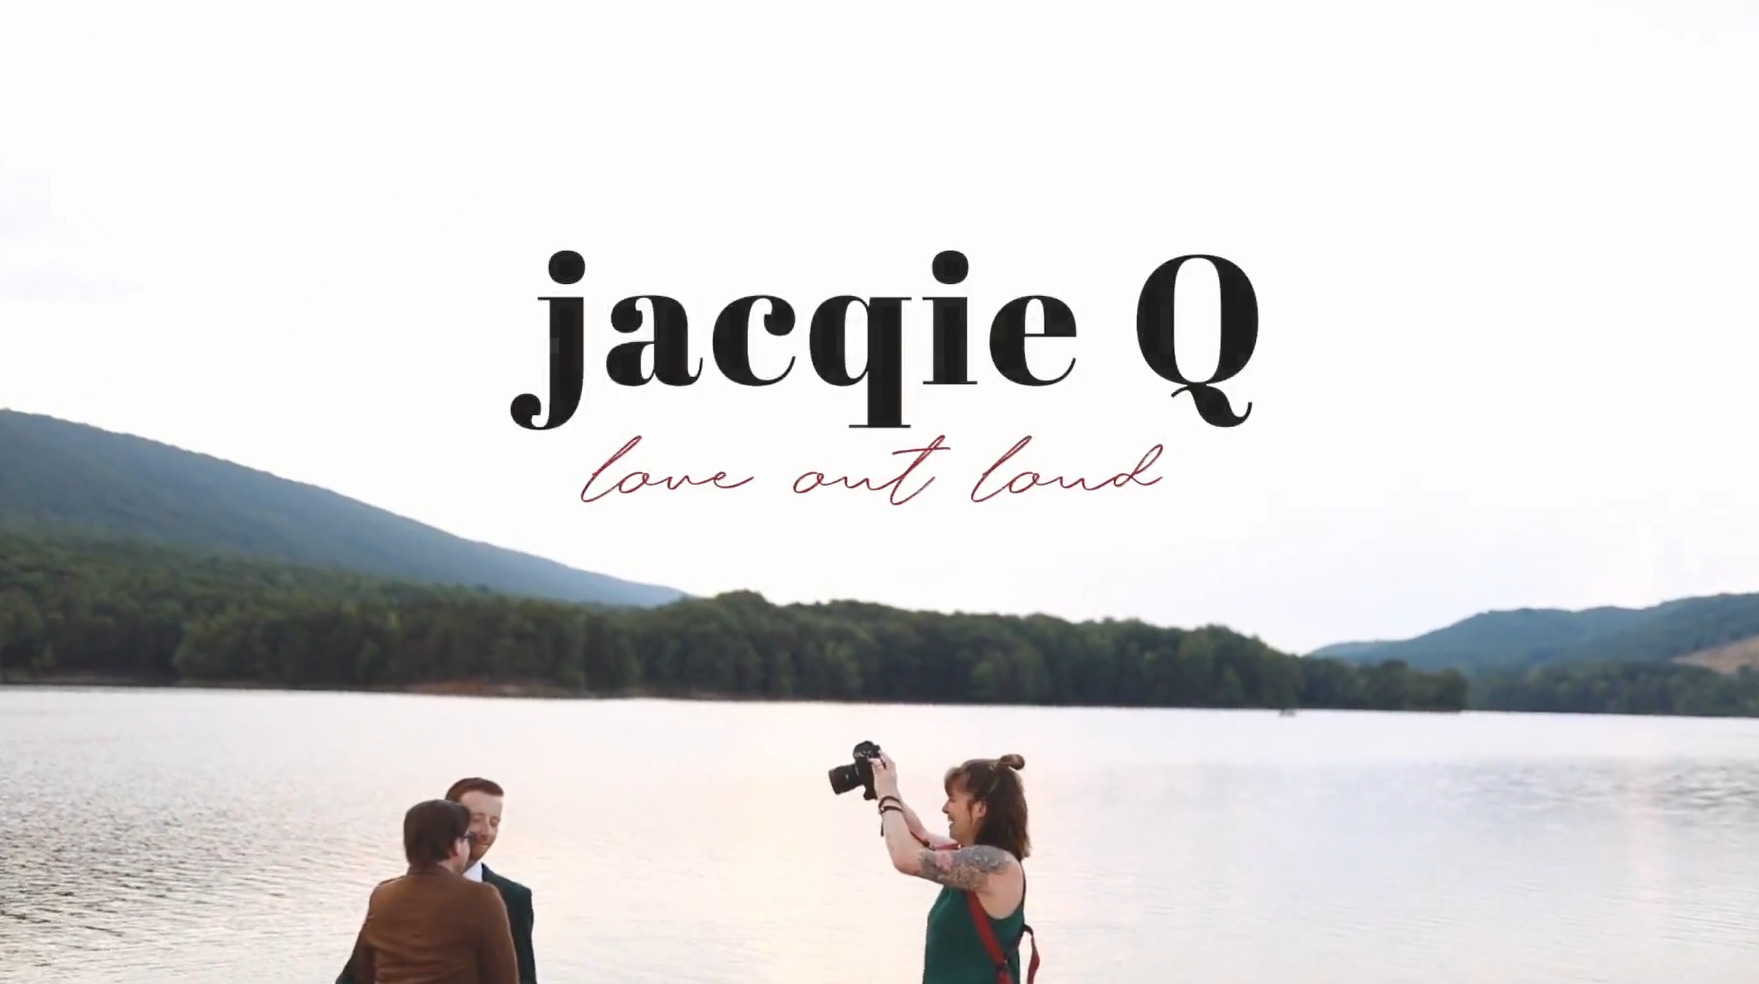 Jacqie Q Photography lesbian lgbtq+ wedding elopement proposal photos Cumberland Maryland USA Dancing With Her magazine